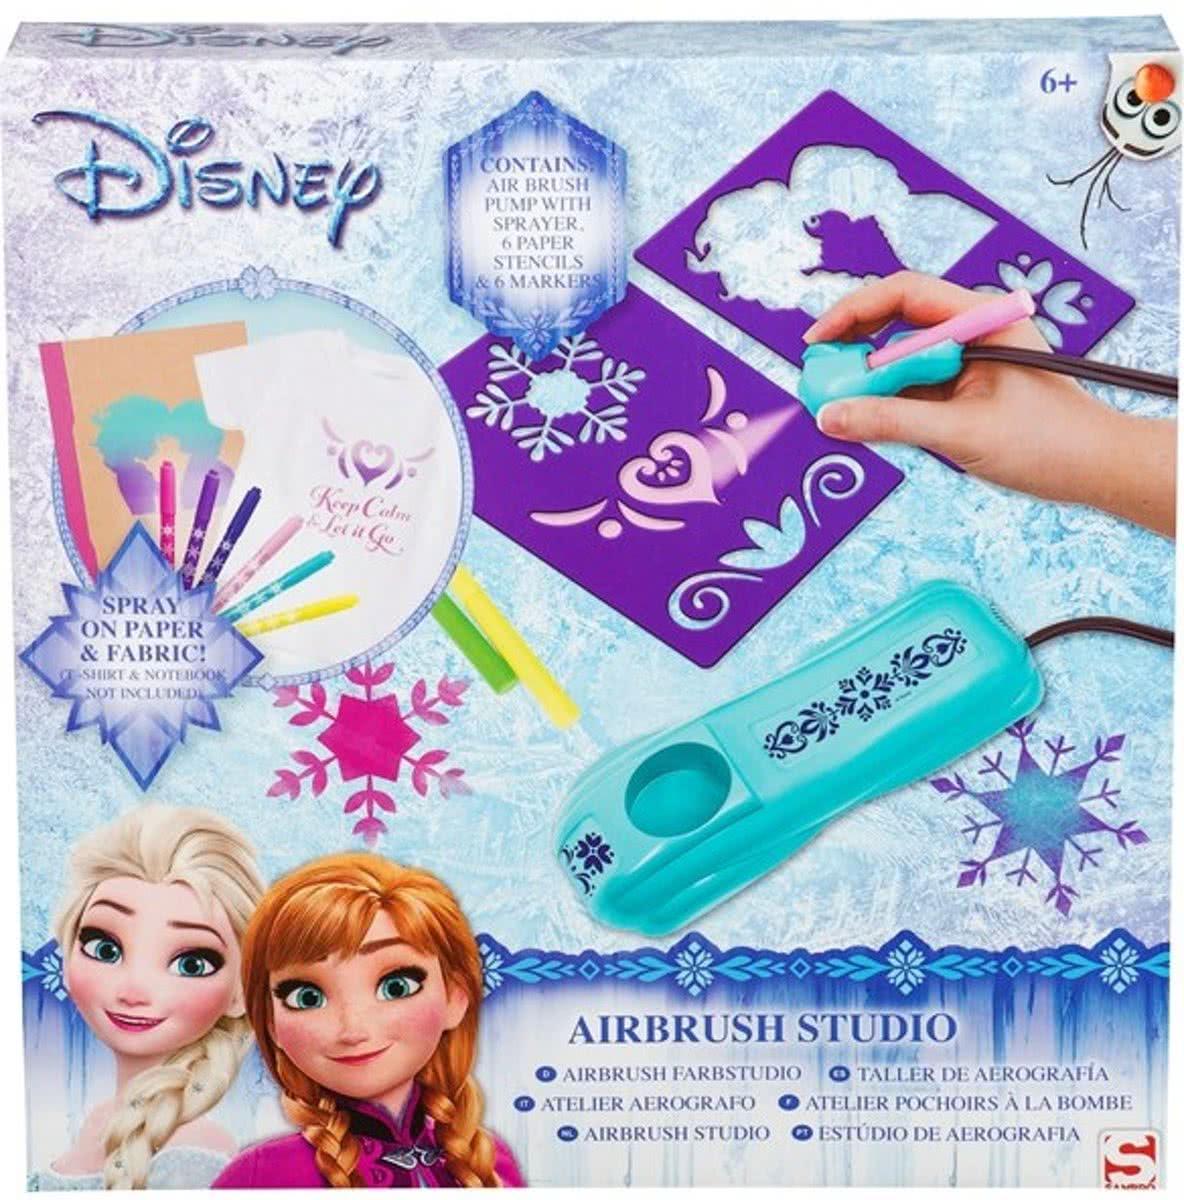 Disney Frozen Verfspuit Studio Electronische Airbrush Station